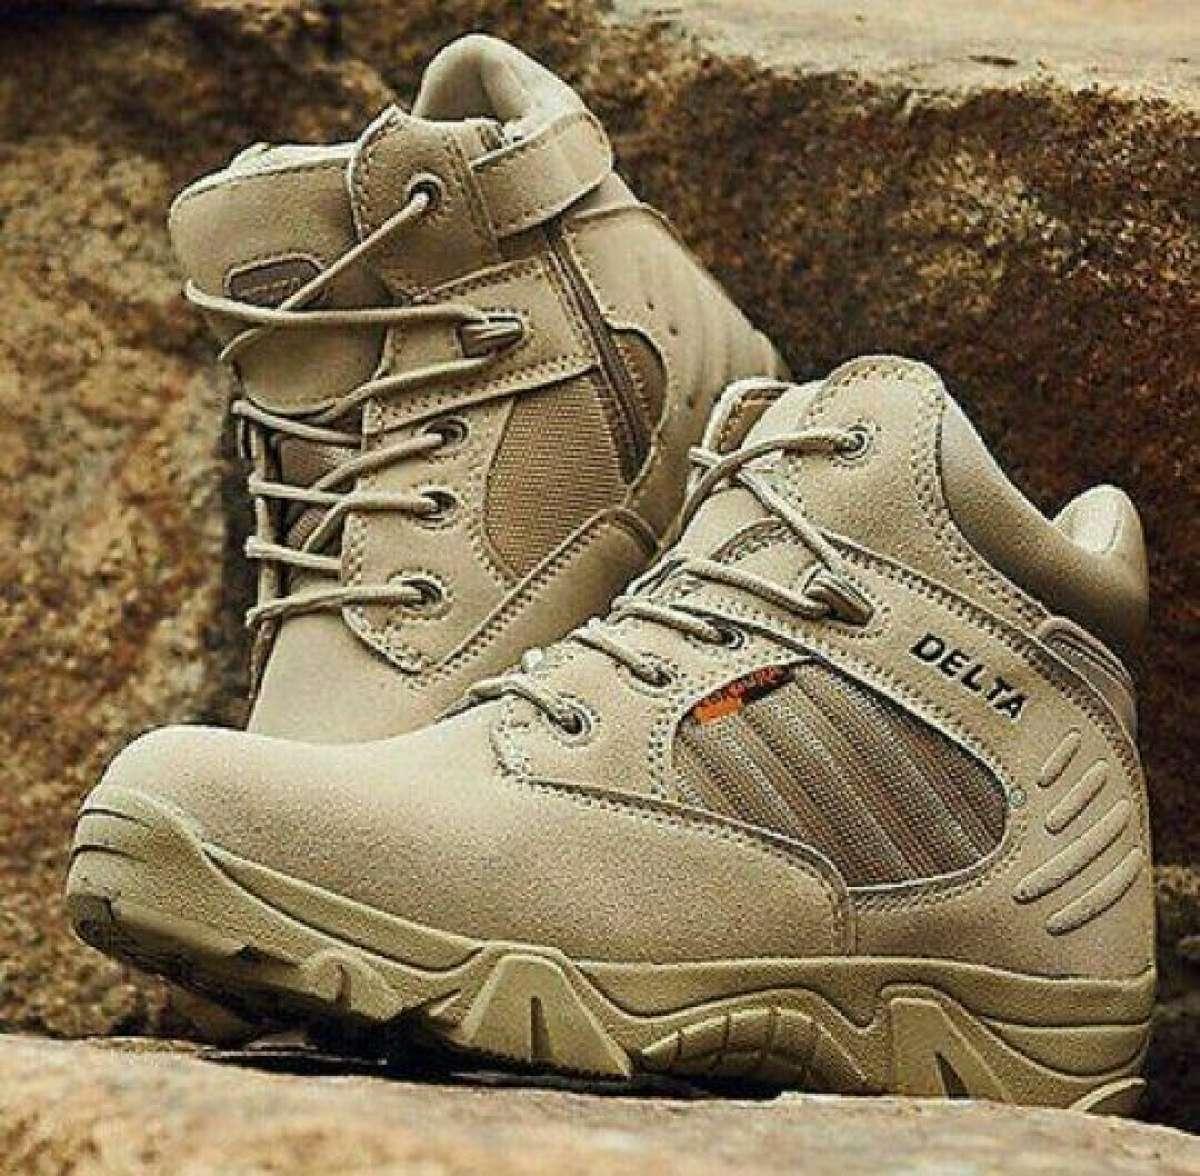 Delta Sepatu Coklat Gurun 6 inchi DB 5450 S Outdor Original ( COD)